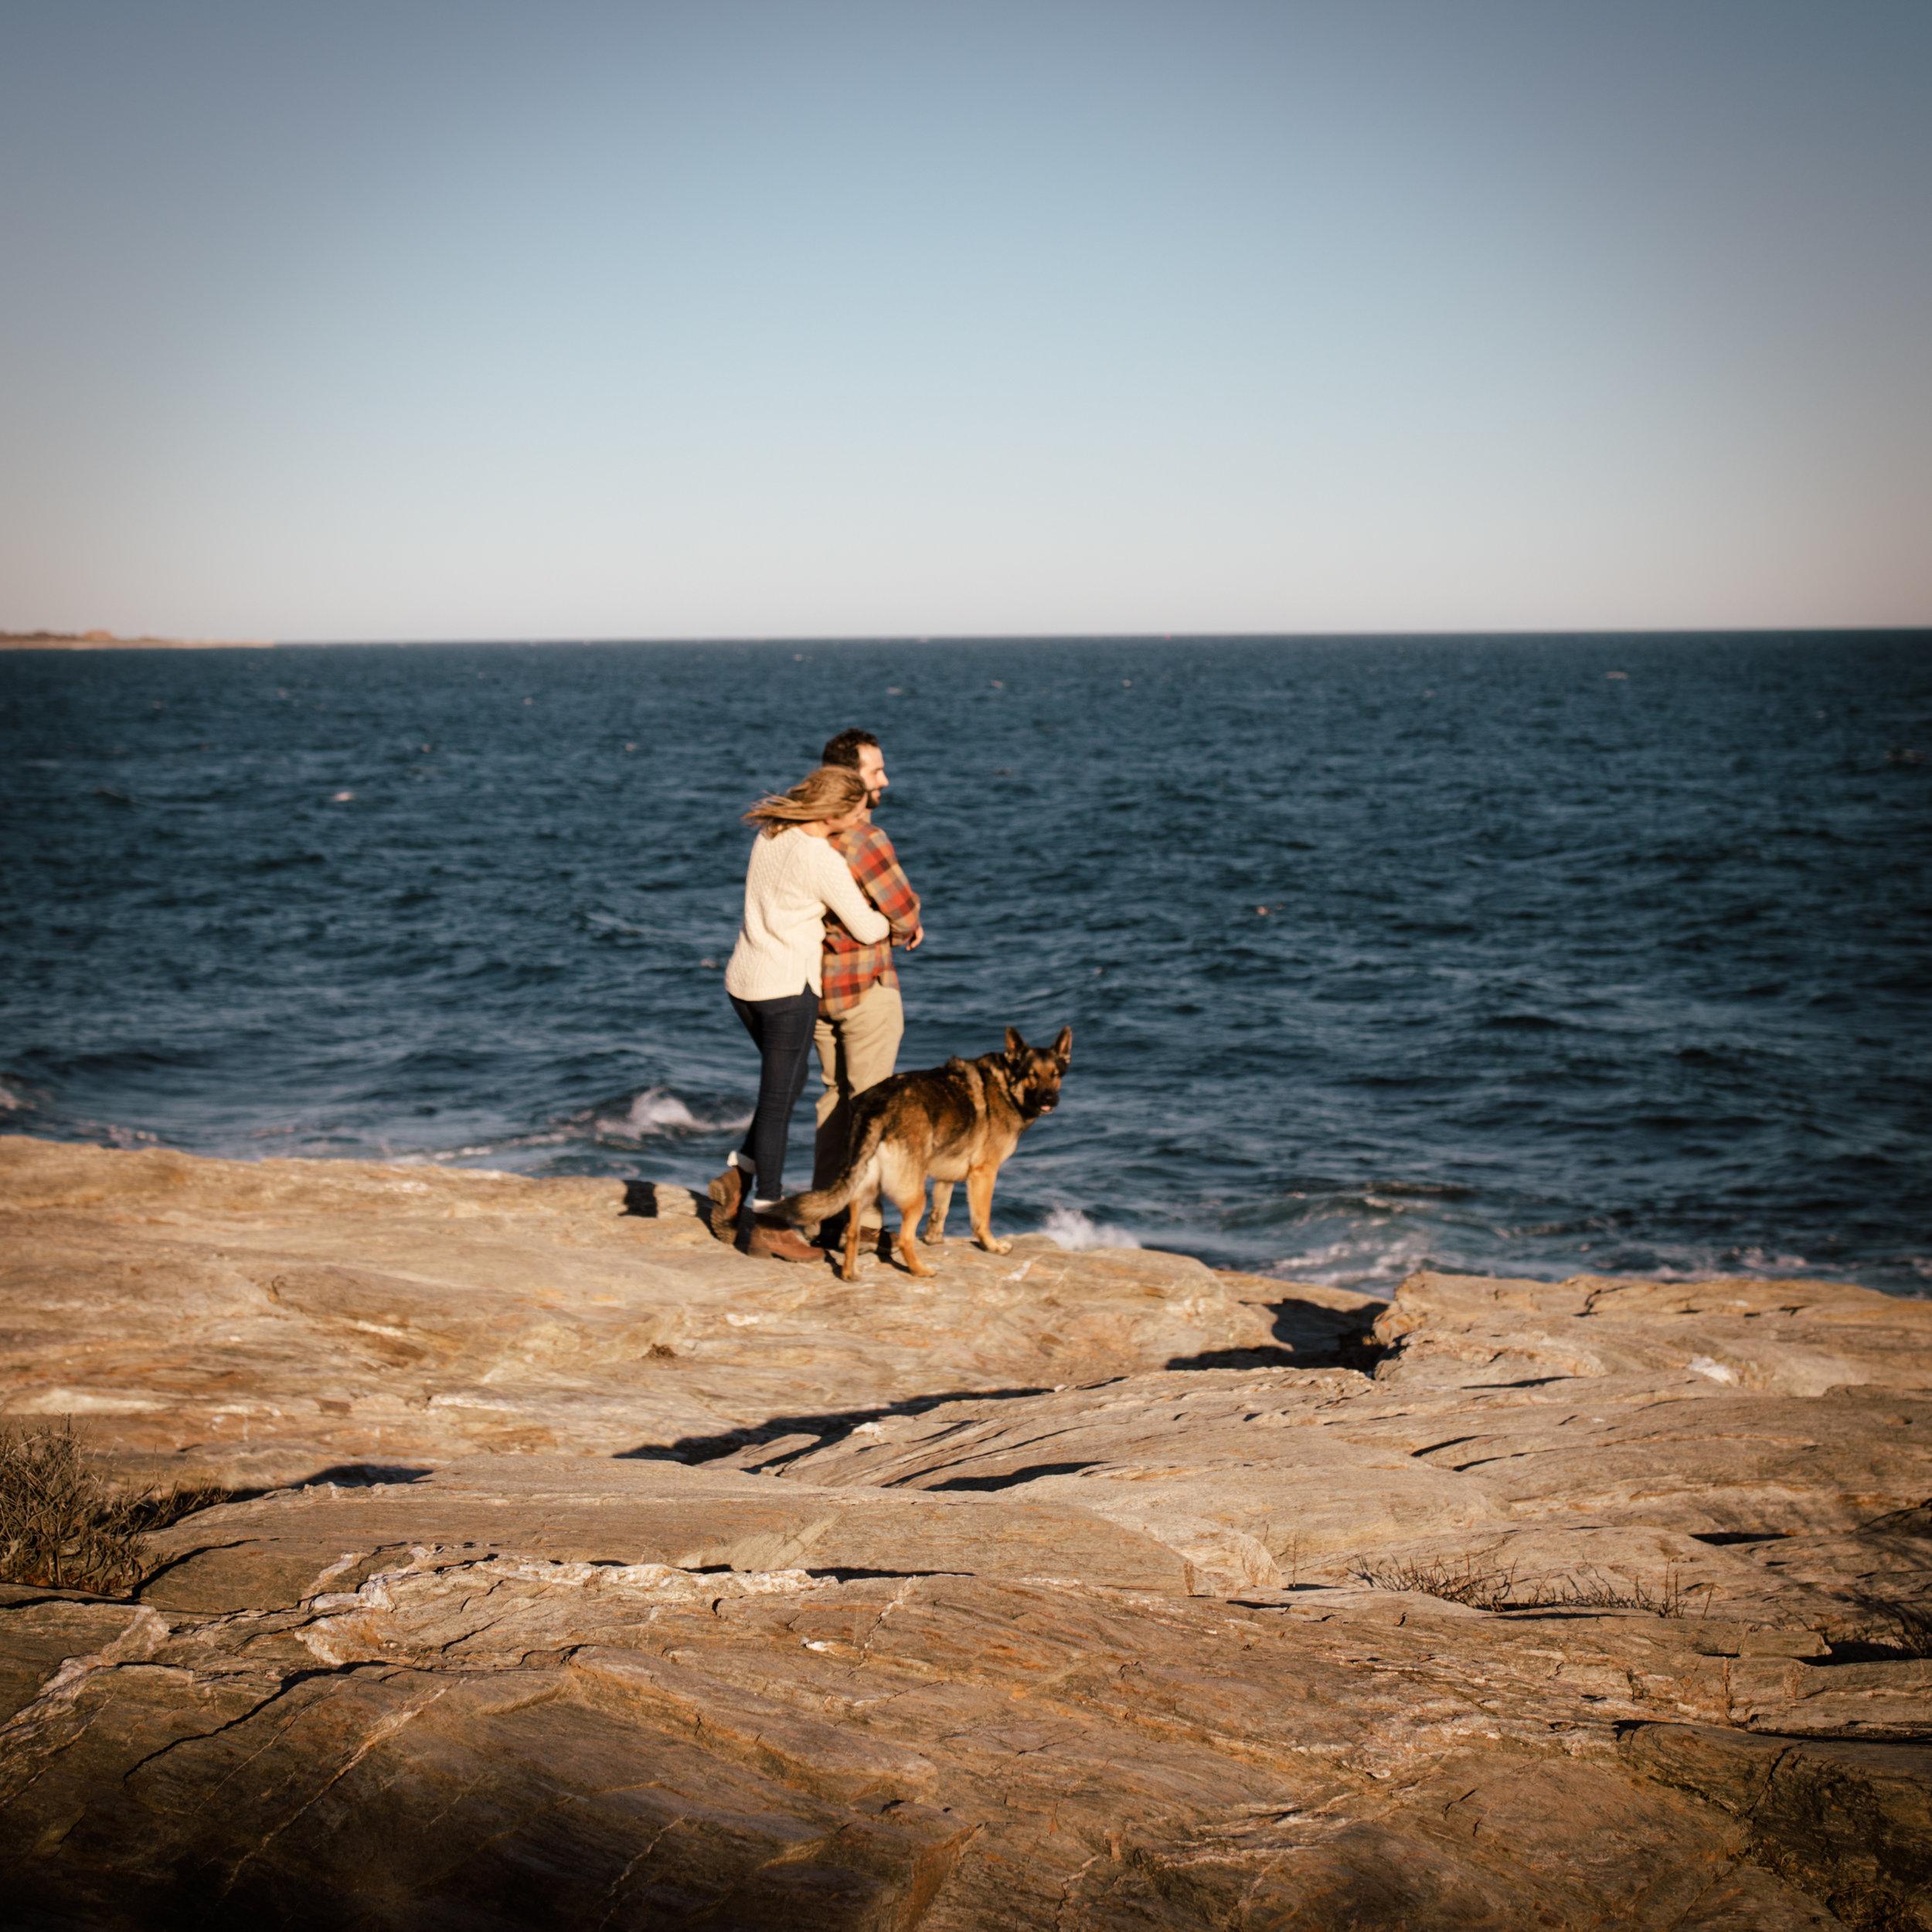 tonya-merke-photography-adventure-rhode-island-9.jpg